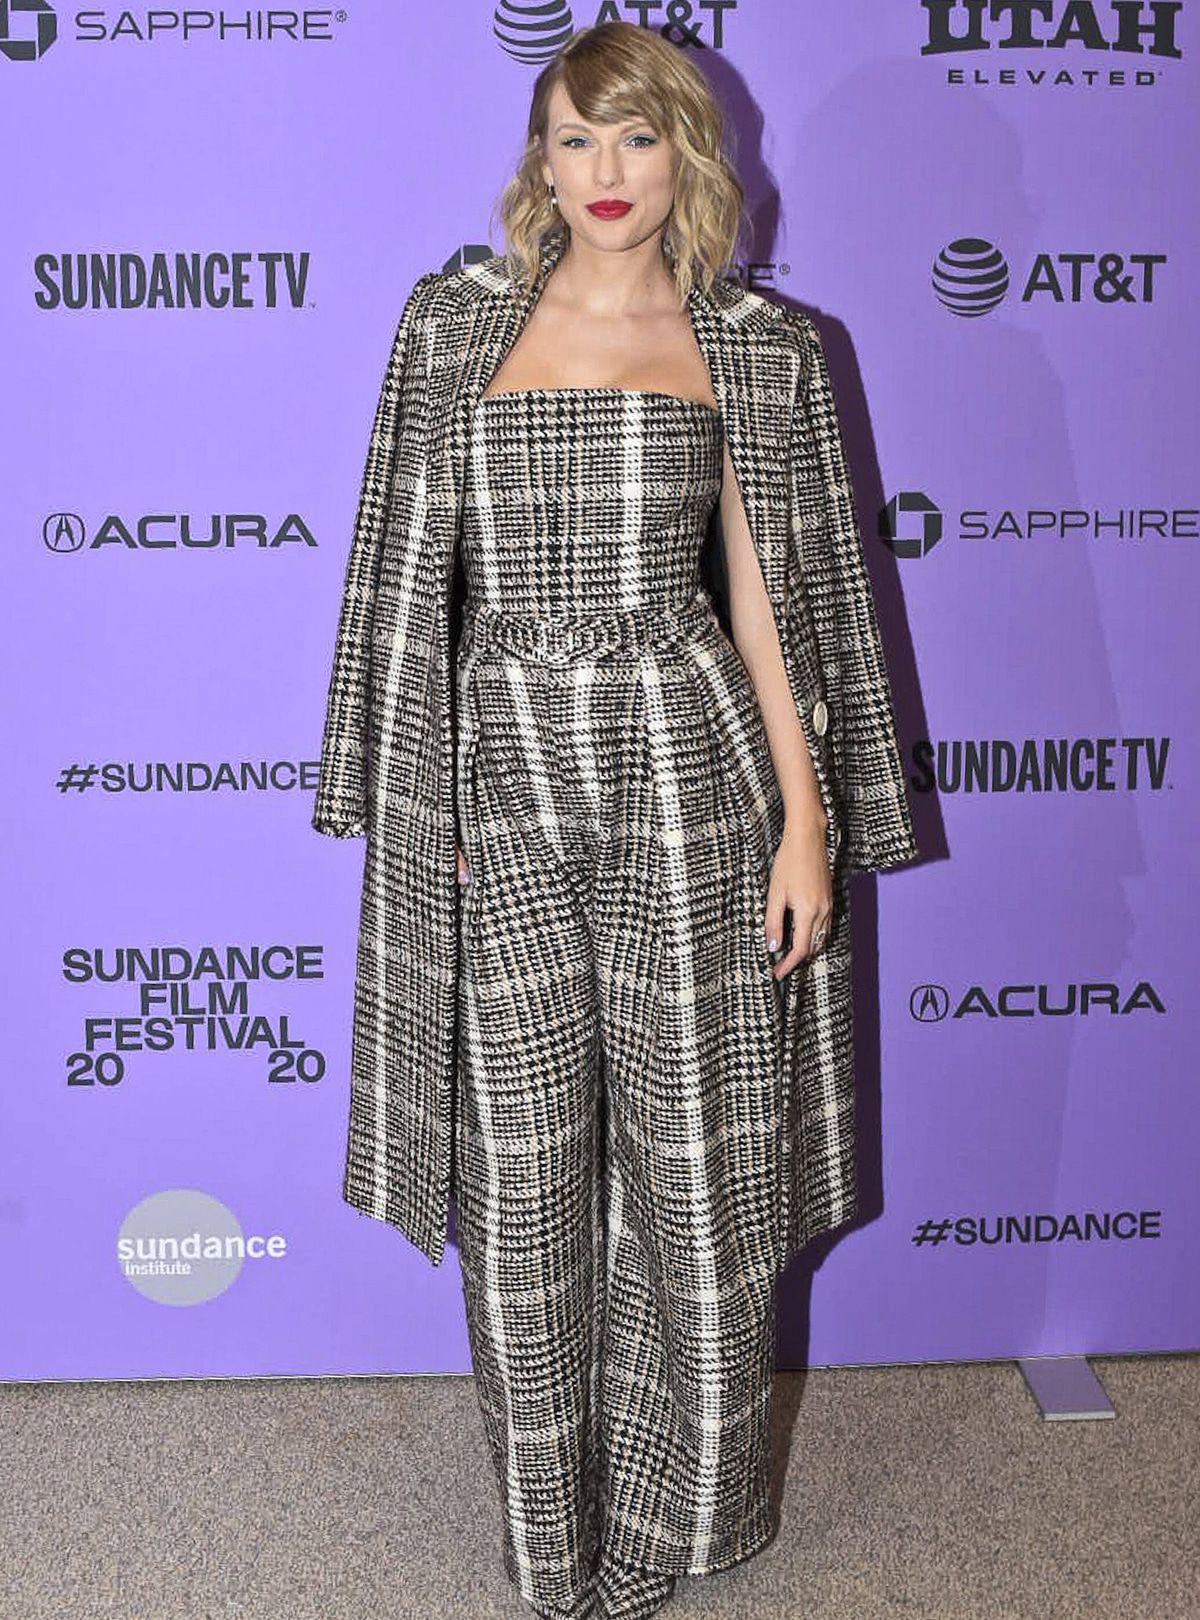 Best Dress of the Day (847): Taylor Swift setzt auf Klassiker